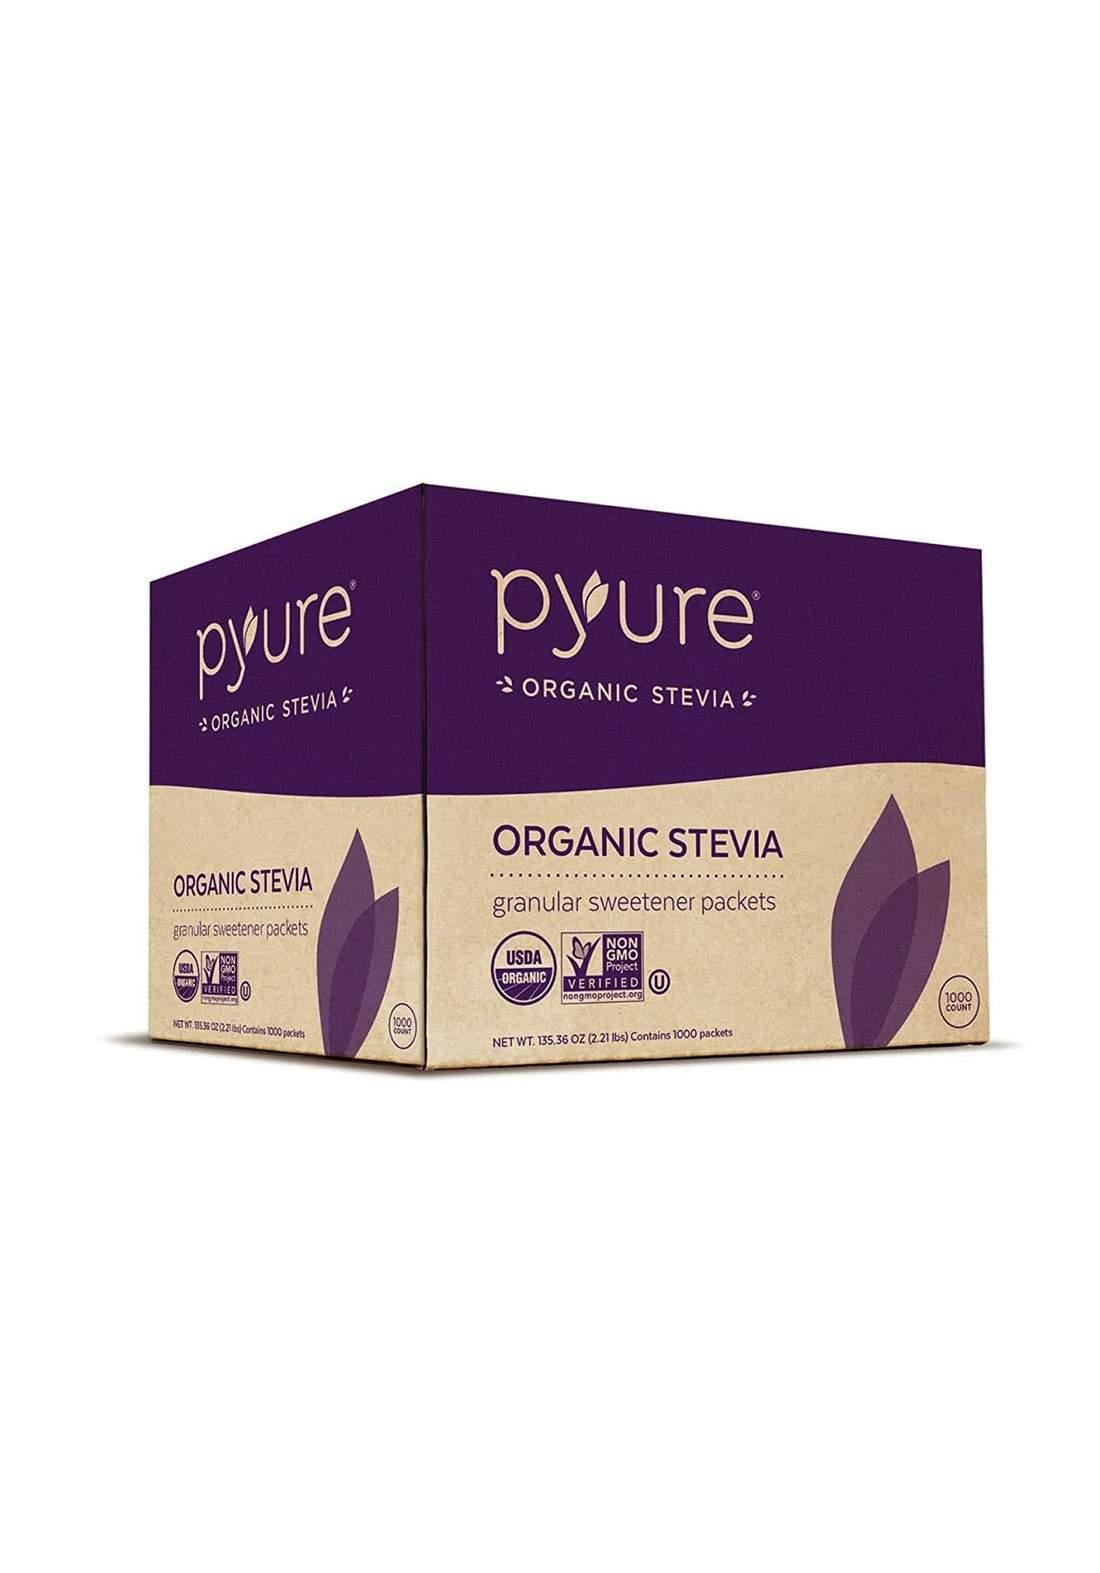 Organic Stevia Ryure 1000 Packets سكر ستيفيا